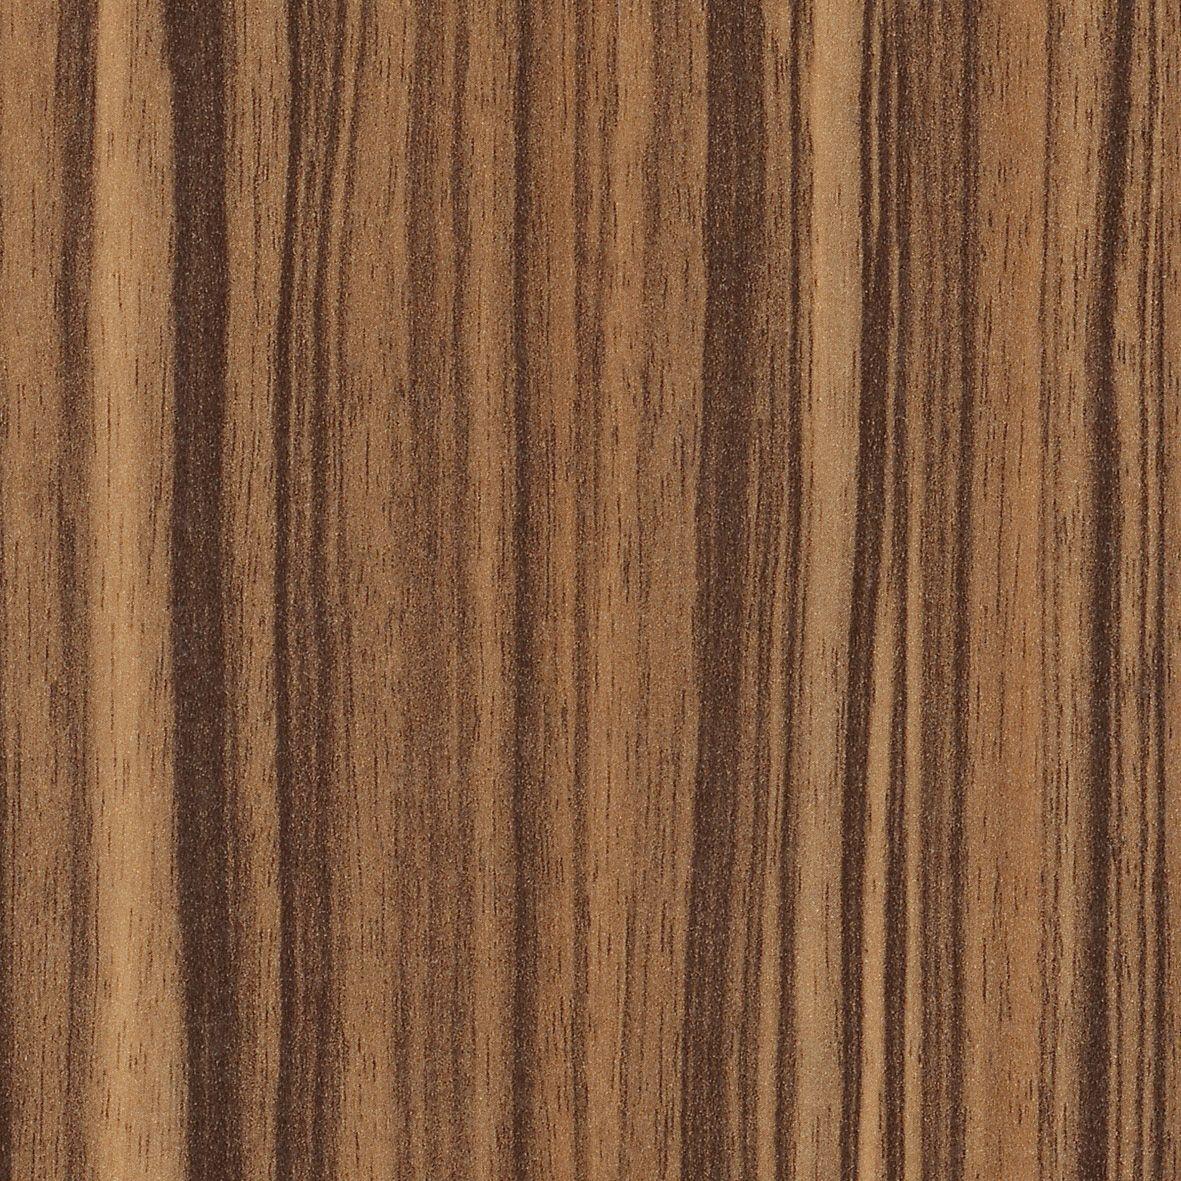 Cantana Zebrano Effect Laminate Flooring Sample 0 06 M² Departments Diy At B Q